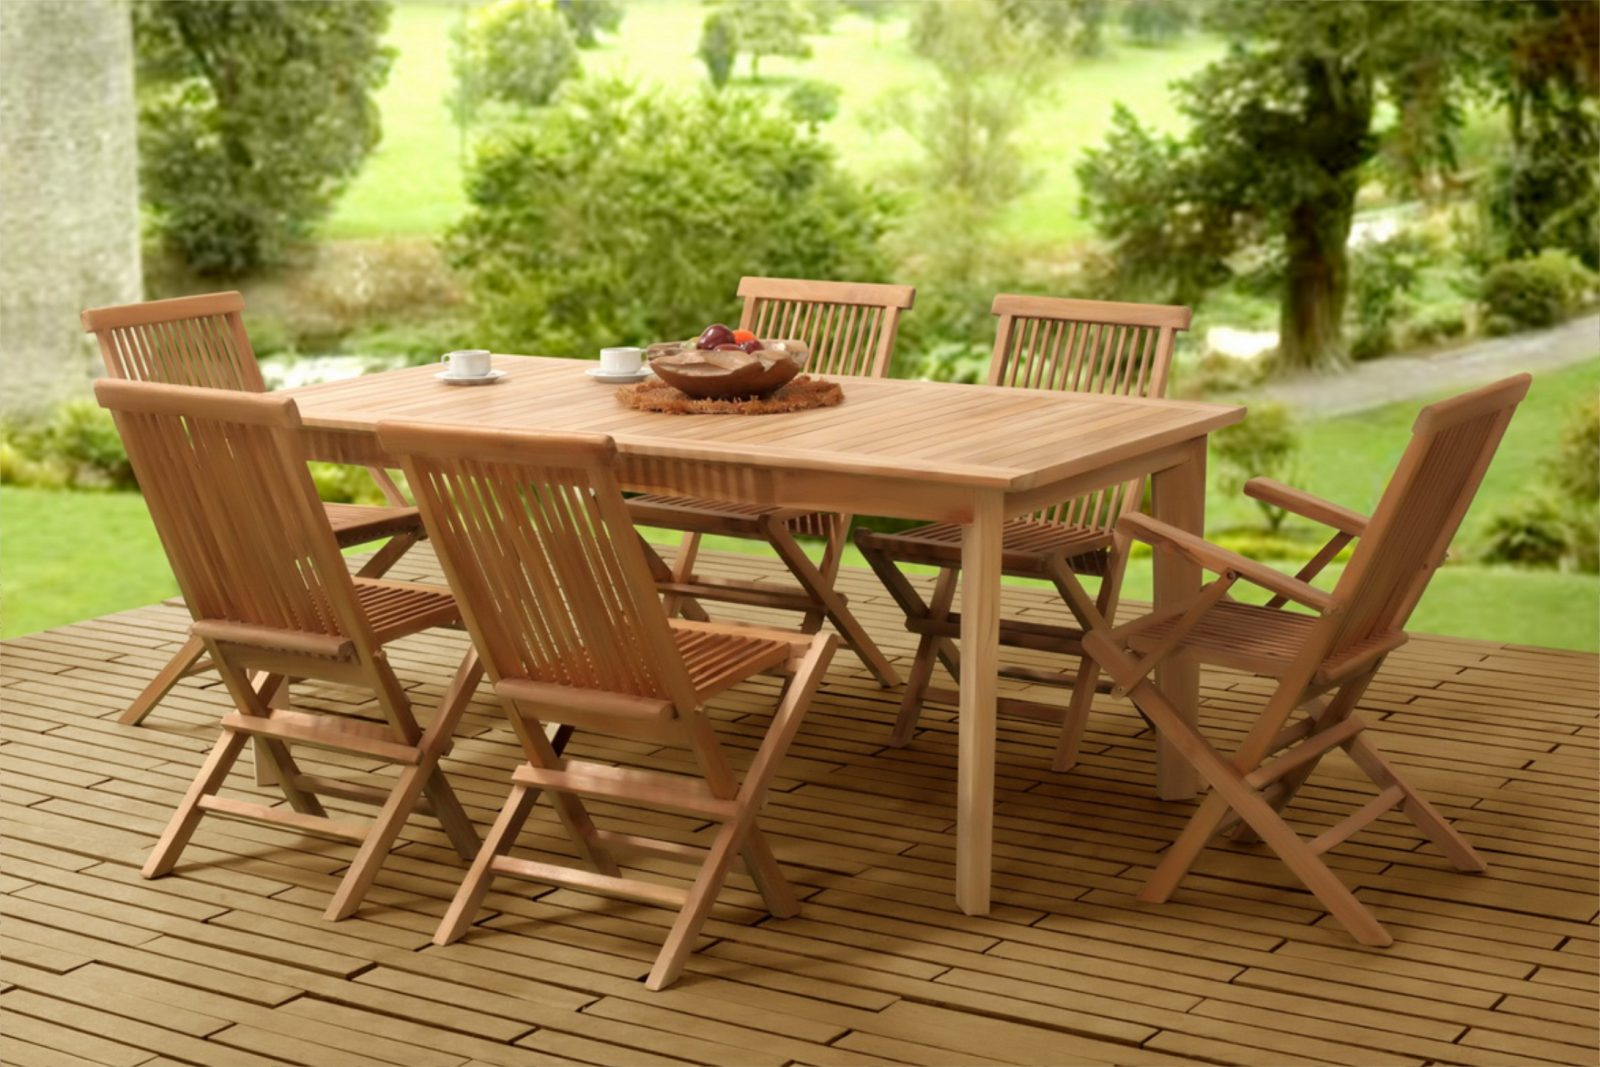 Wooden Classic Folding Dining Set Indonesia Teak Wood Furniture Jepara Wood Furniture